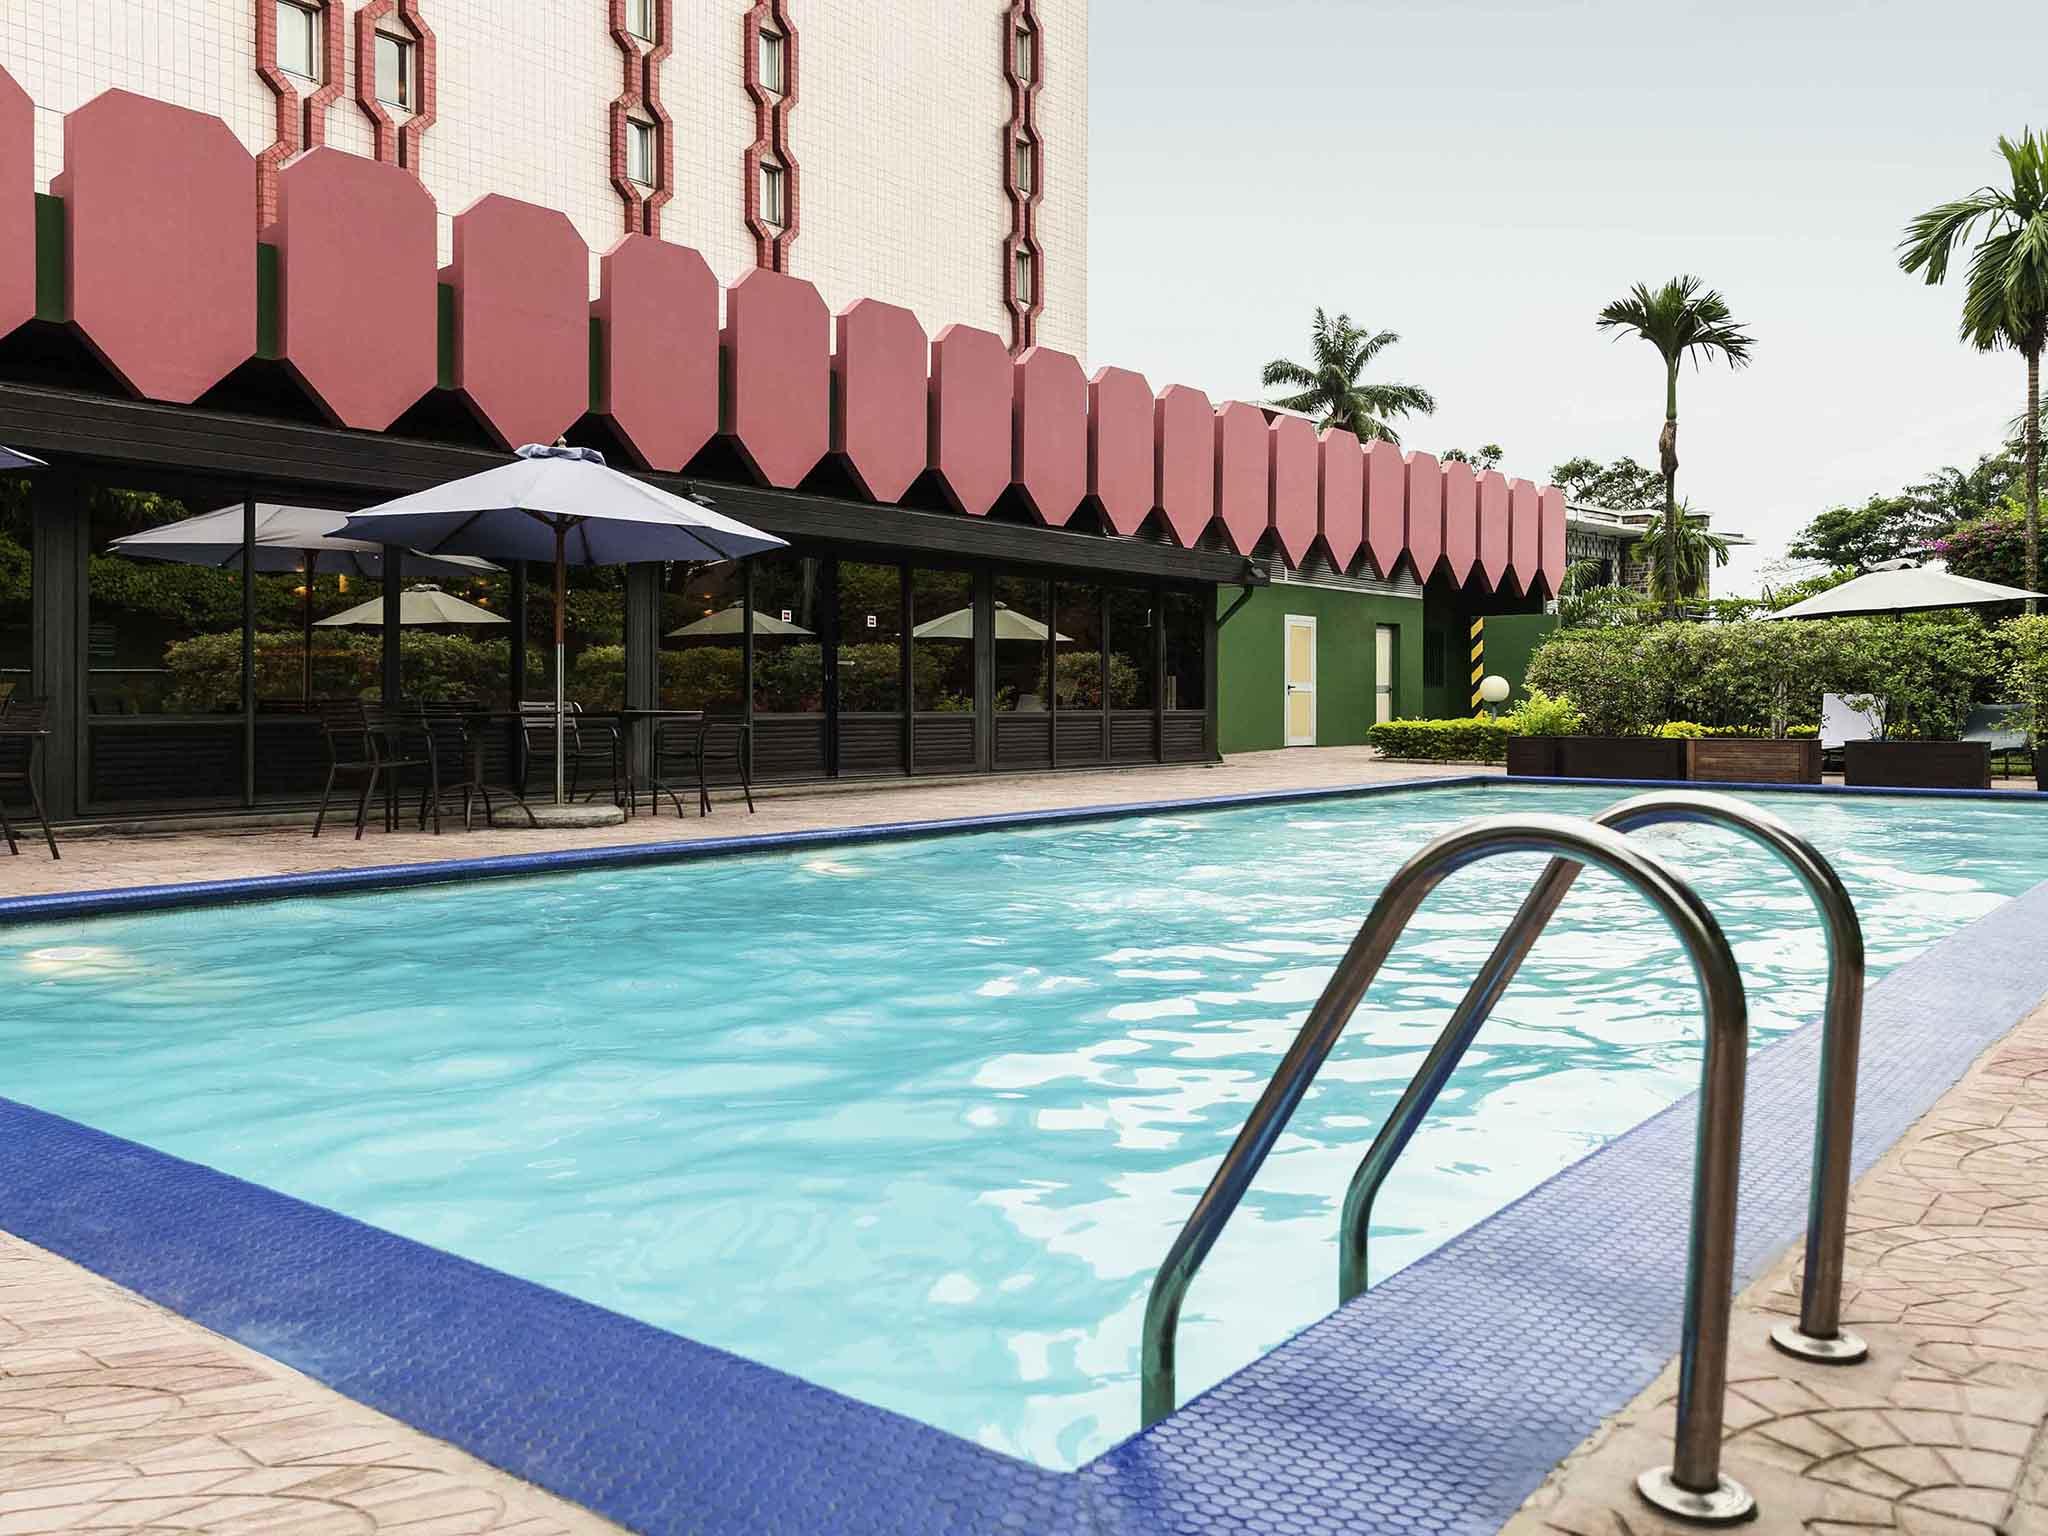 Hotel Ibis Douala